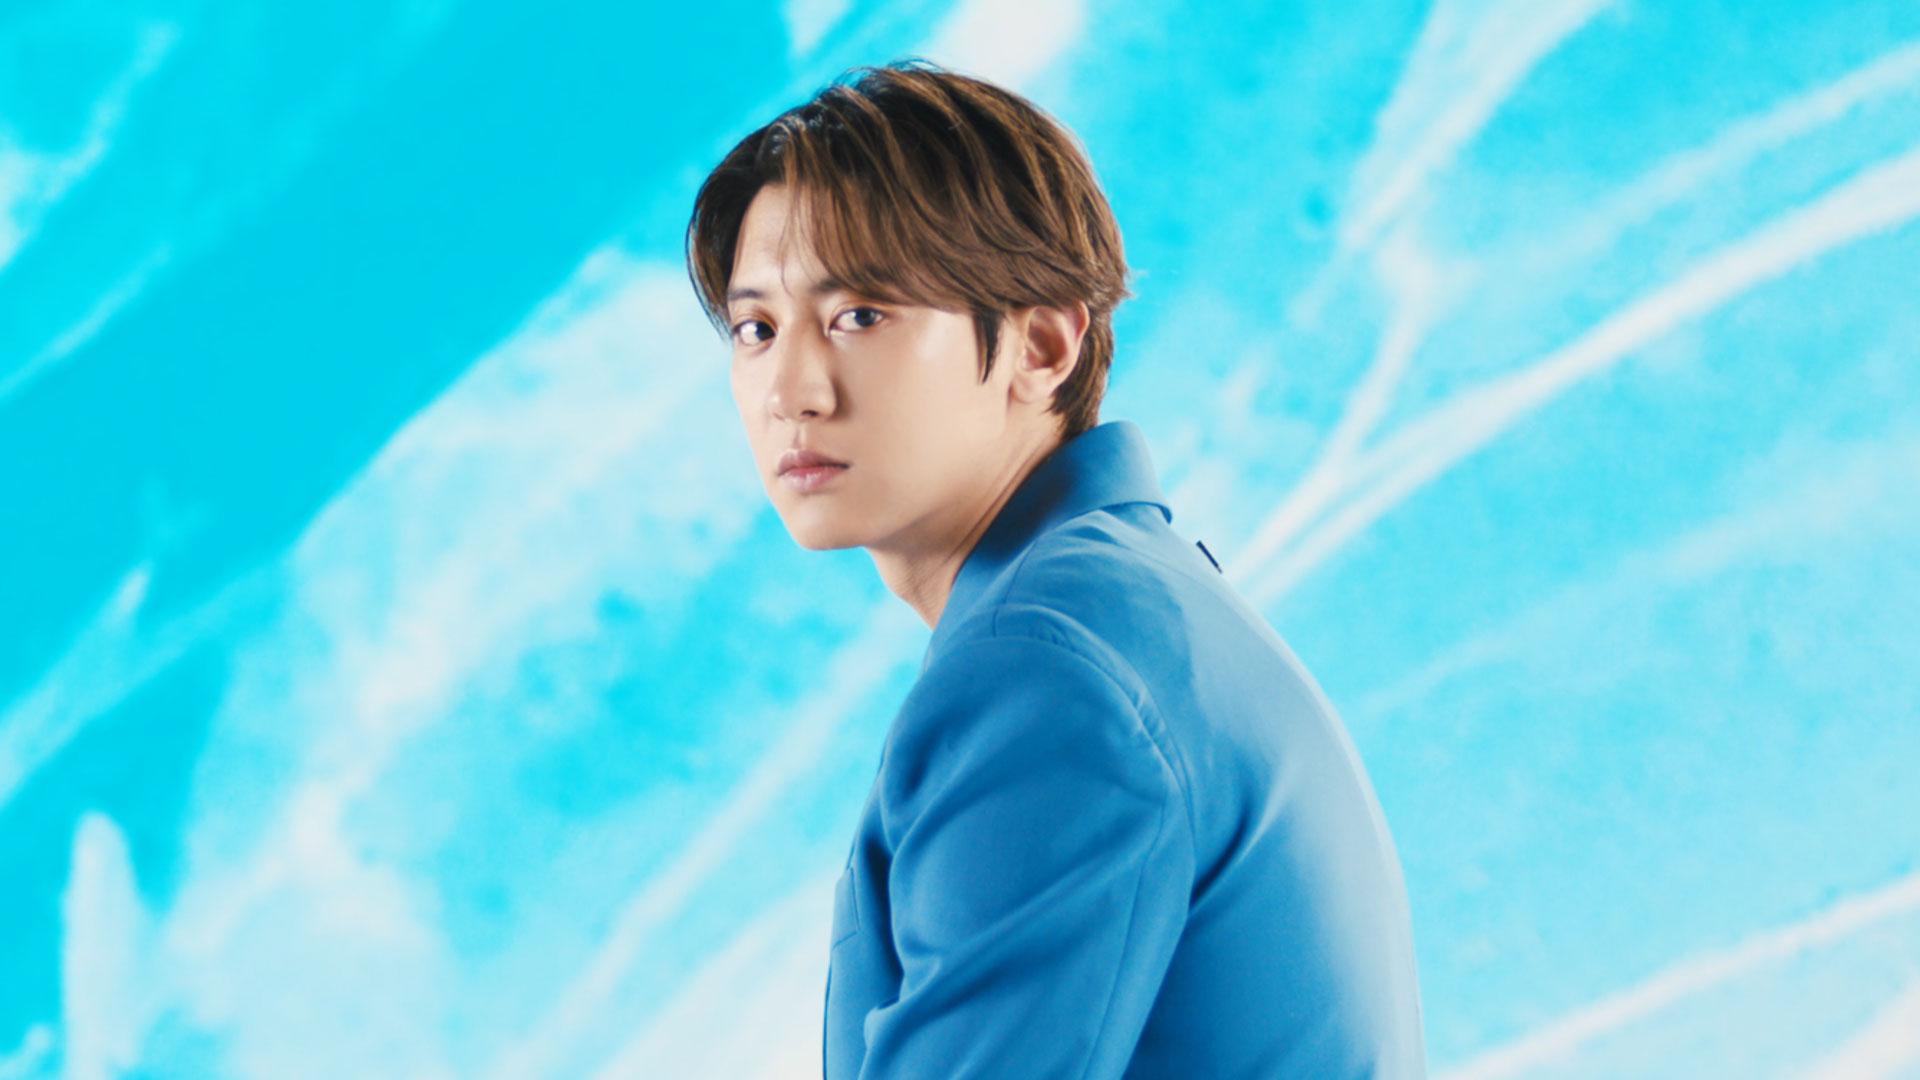 Raiden X 찬열 CHANYEOL 'Yours (Feat. 이하이, 창모)' MV